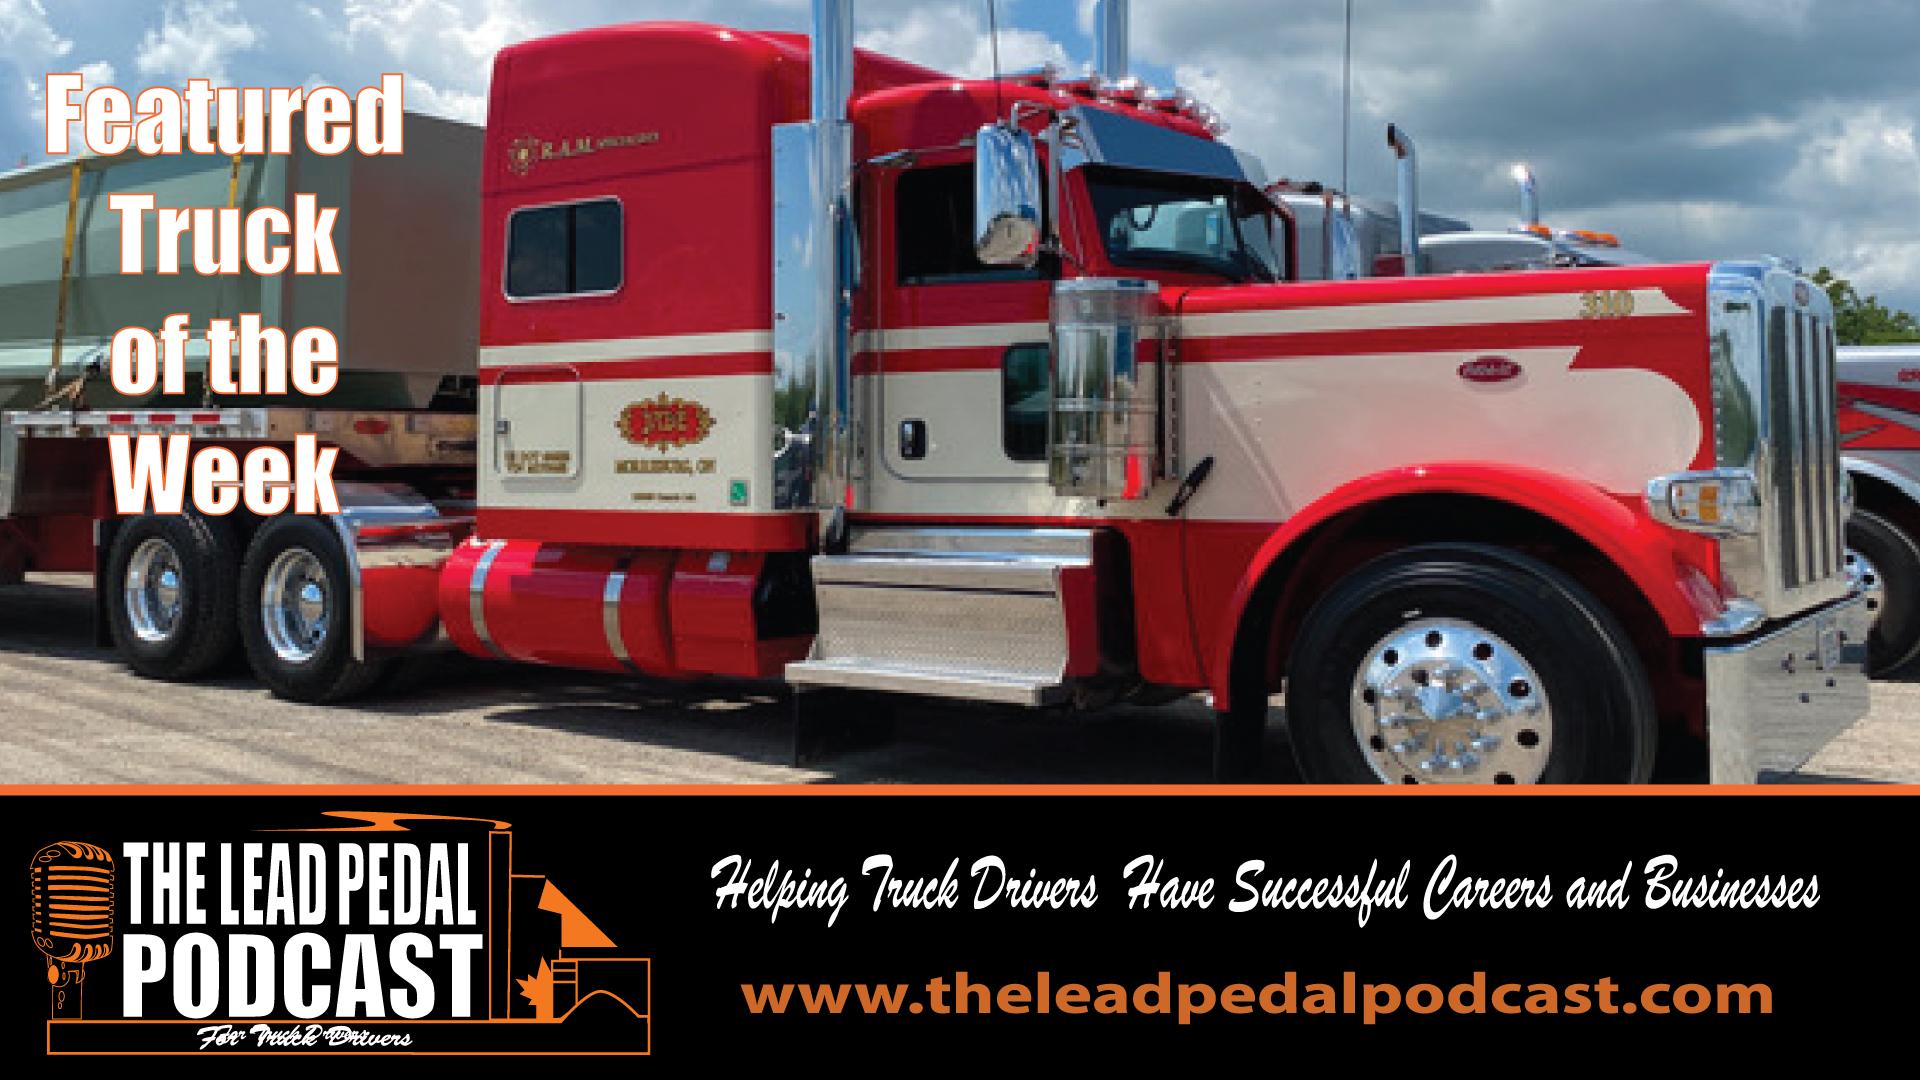 Jade-Featured Truck